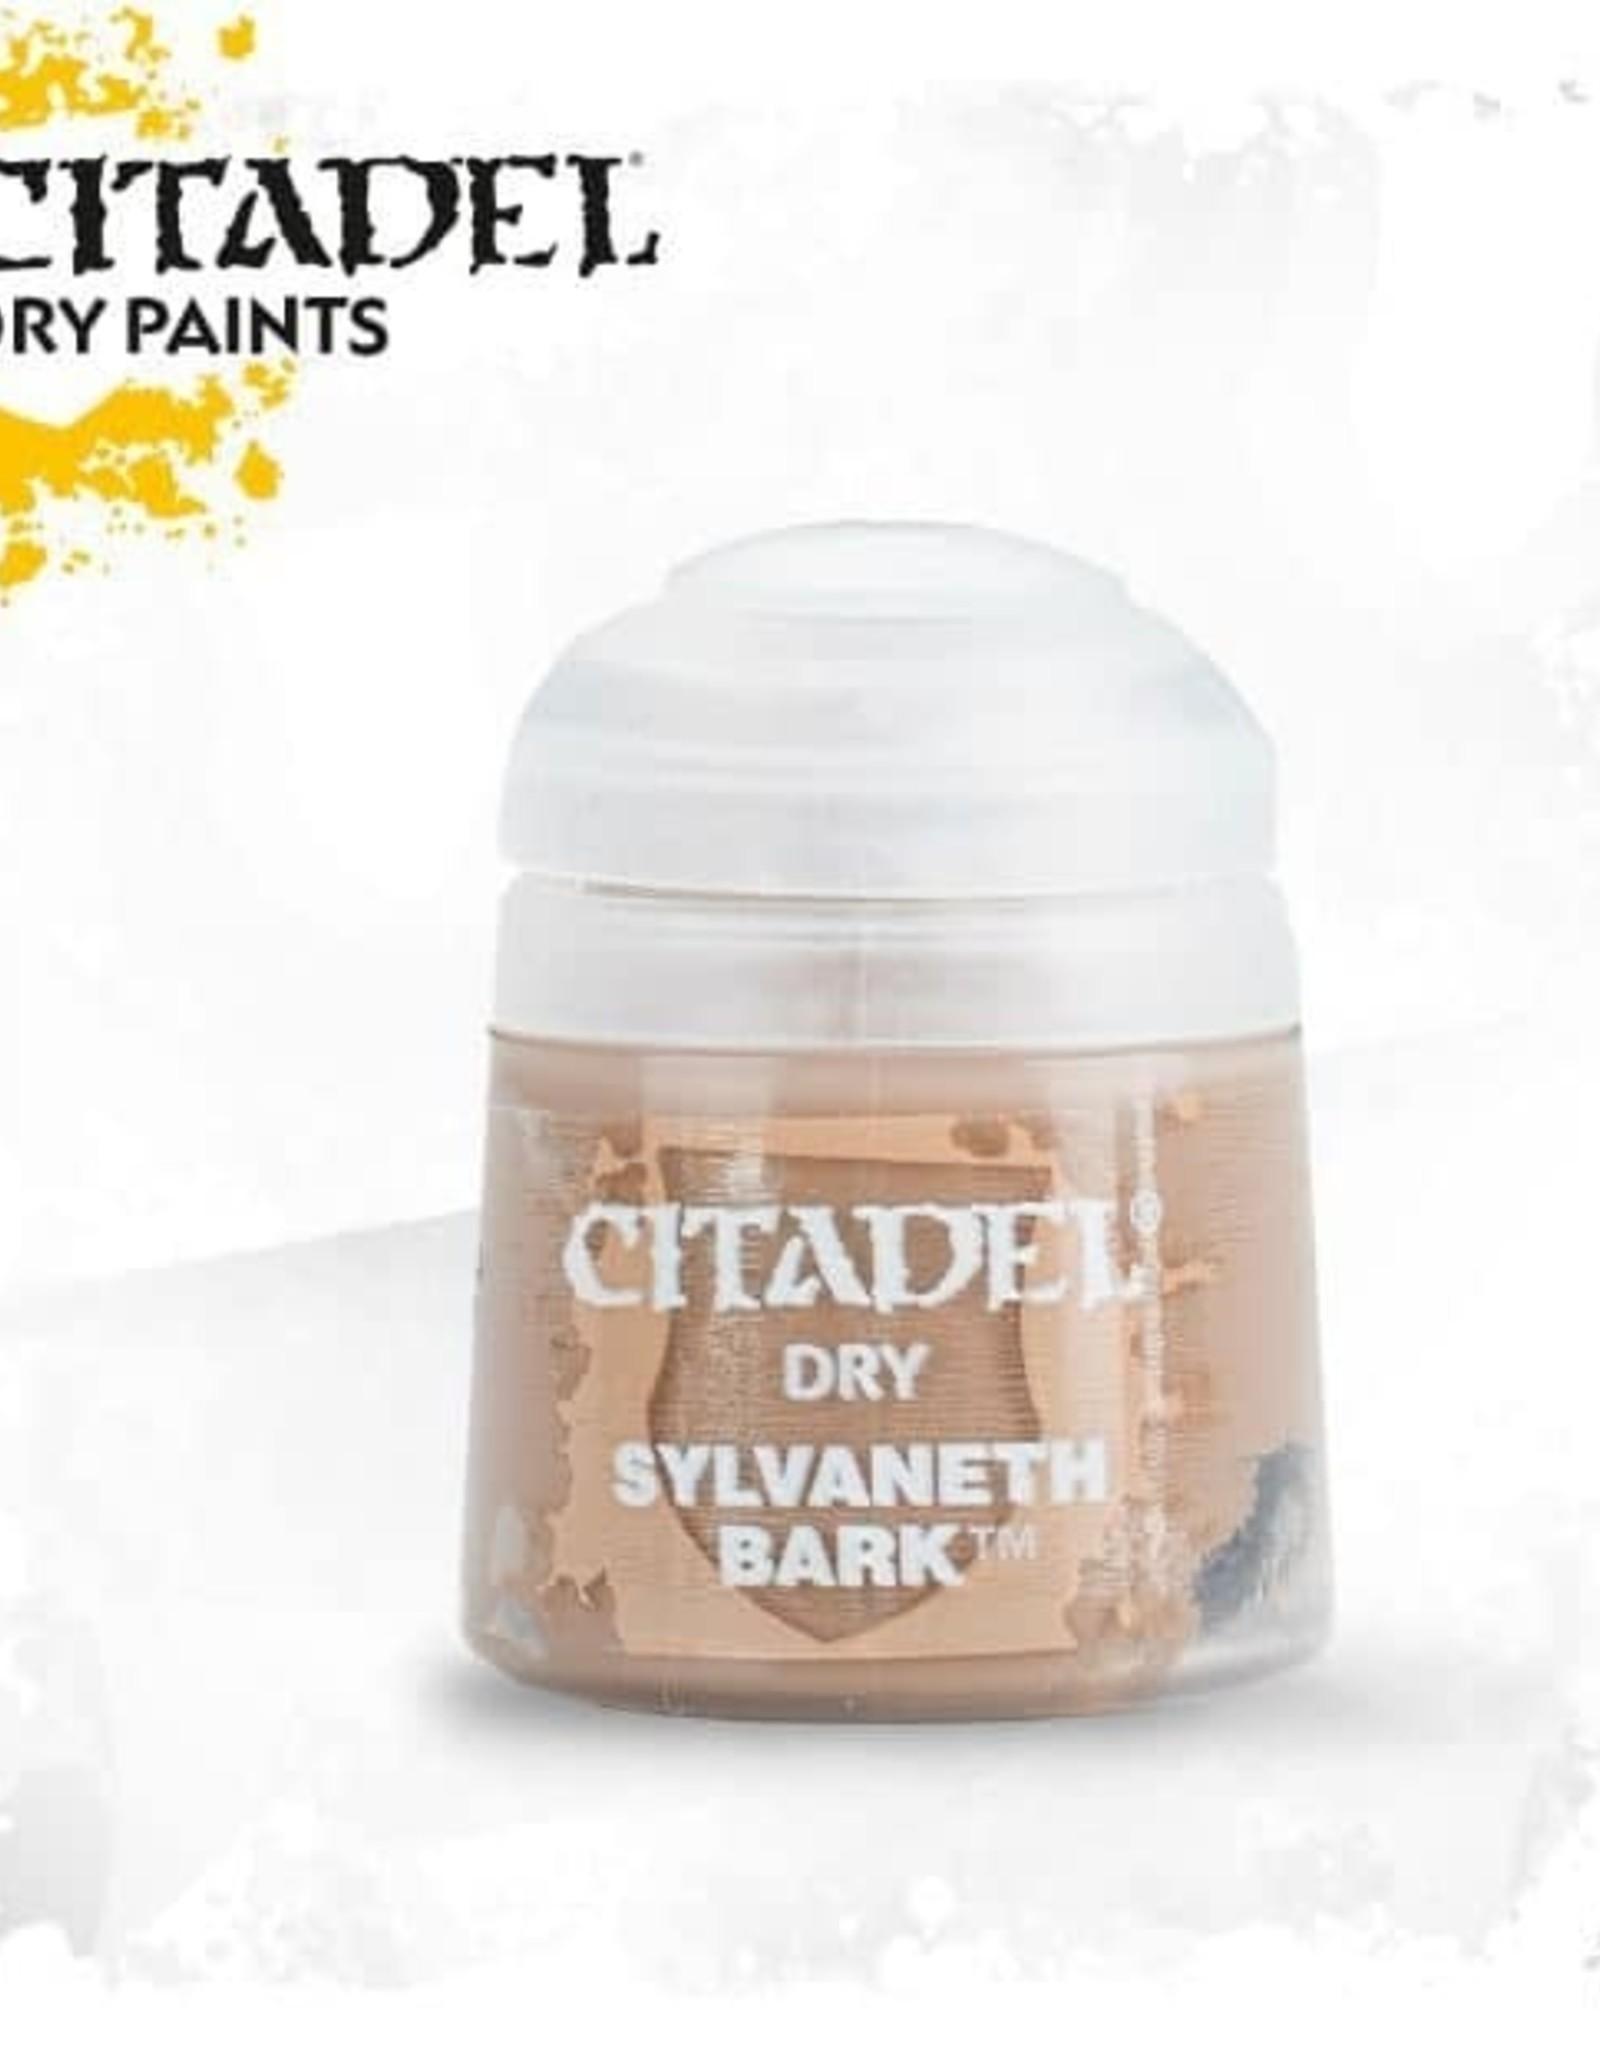 Games Workshop Citadel Paint: Dry - Sylvaneth Bark